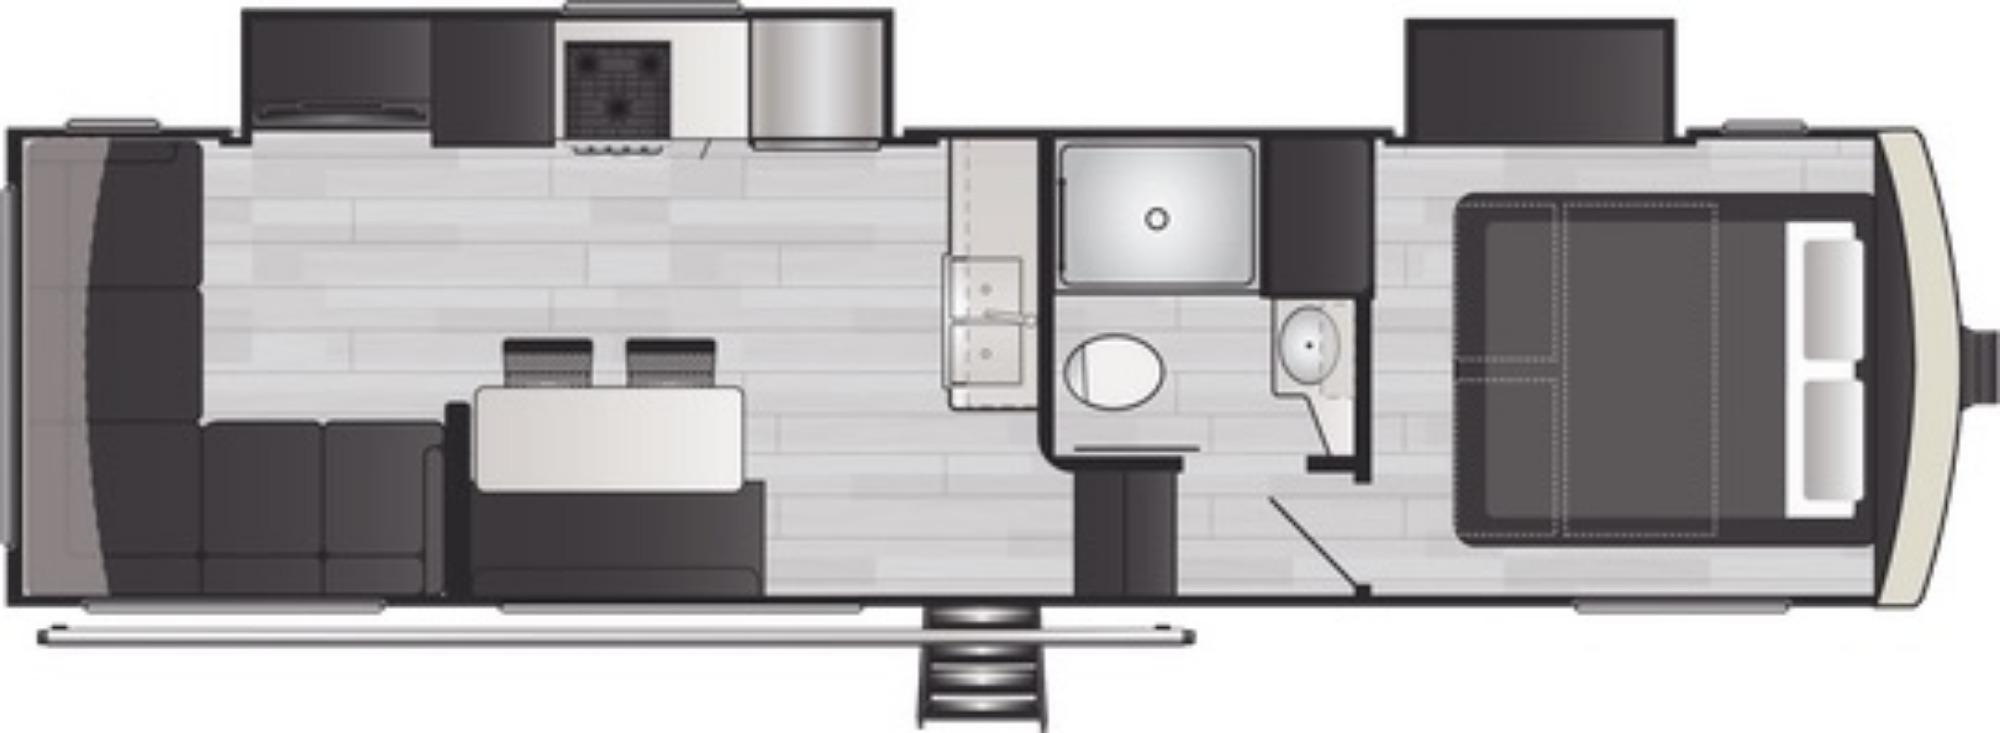 View Floor Plan for 2021 KEYSTONE ARCADIA 3250RL